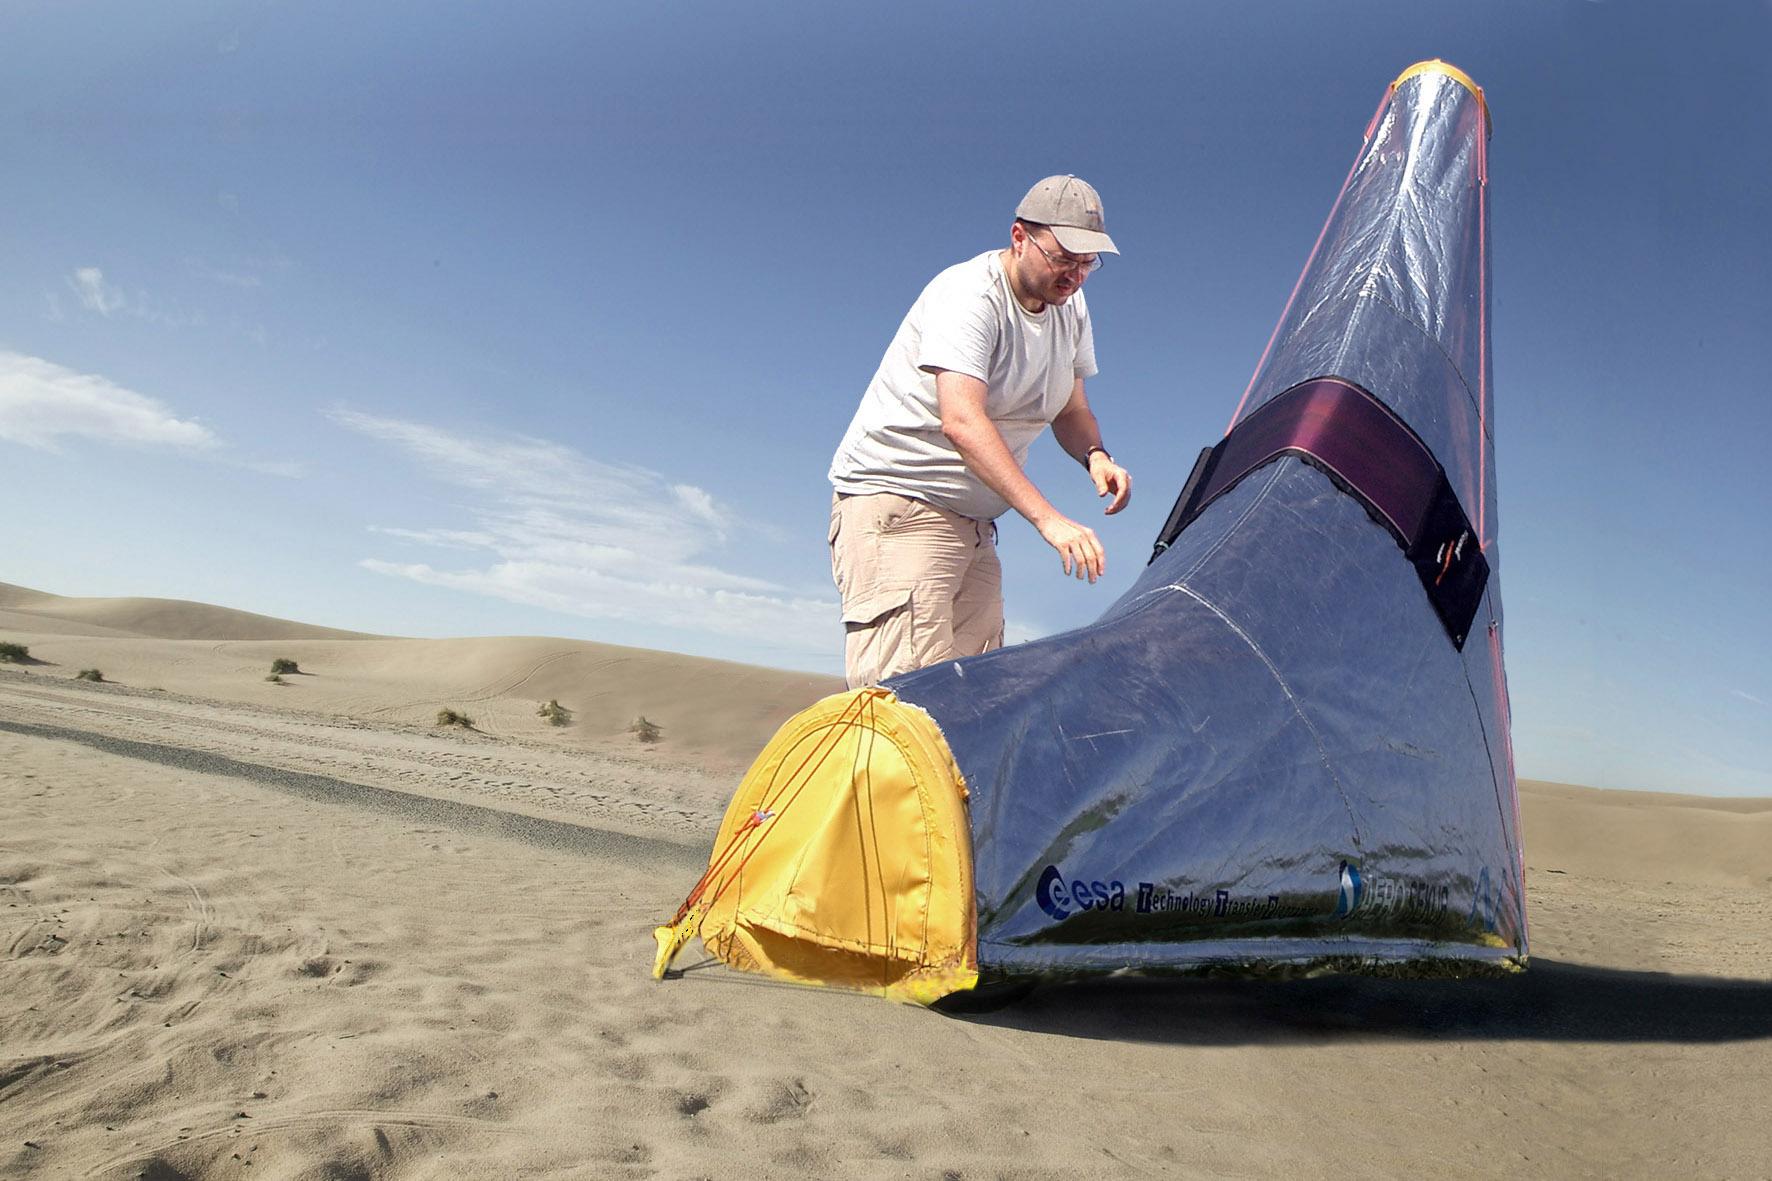 A ... & Desert Seal u2013 Desert Tent   74 FOOTWEAR DESIGN CONSULTING